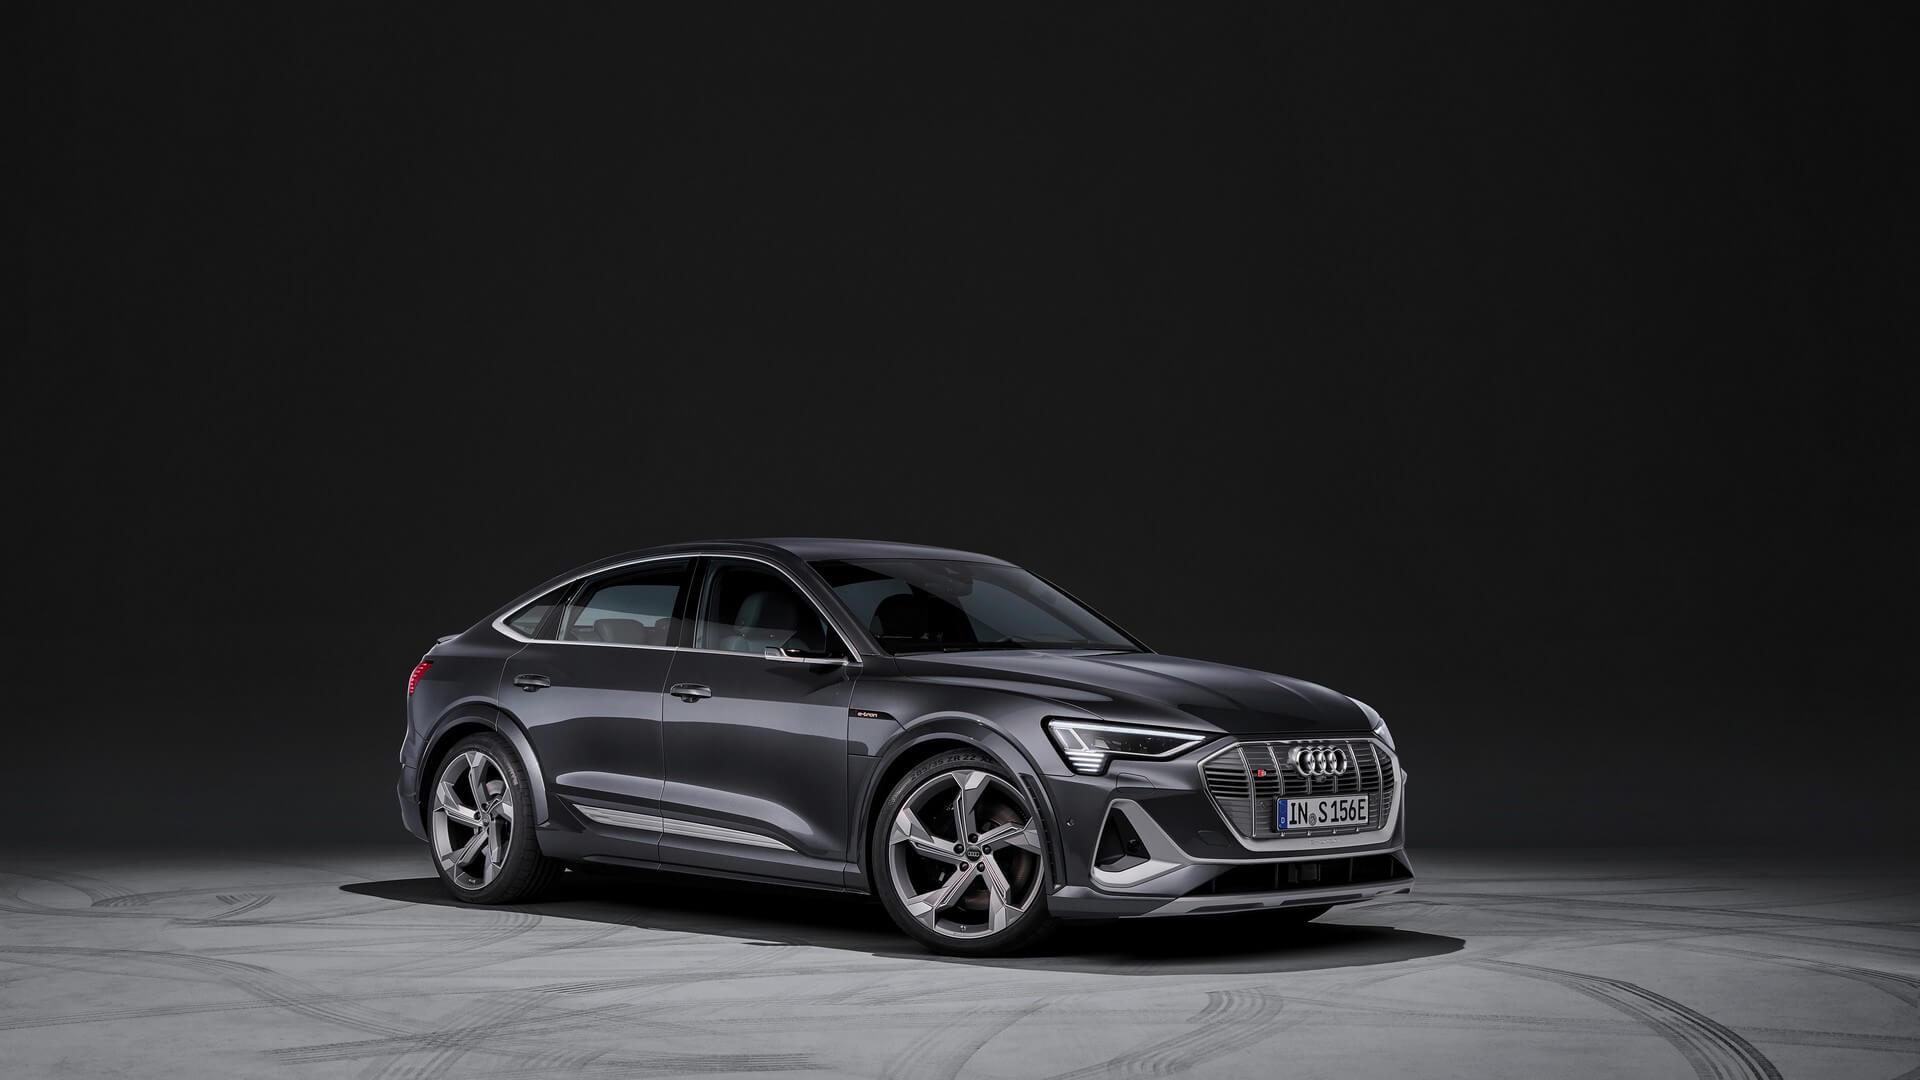 Audi-E-Tron-S-and-E-Tron-S-Sportback-2020-64